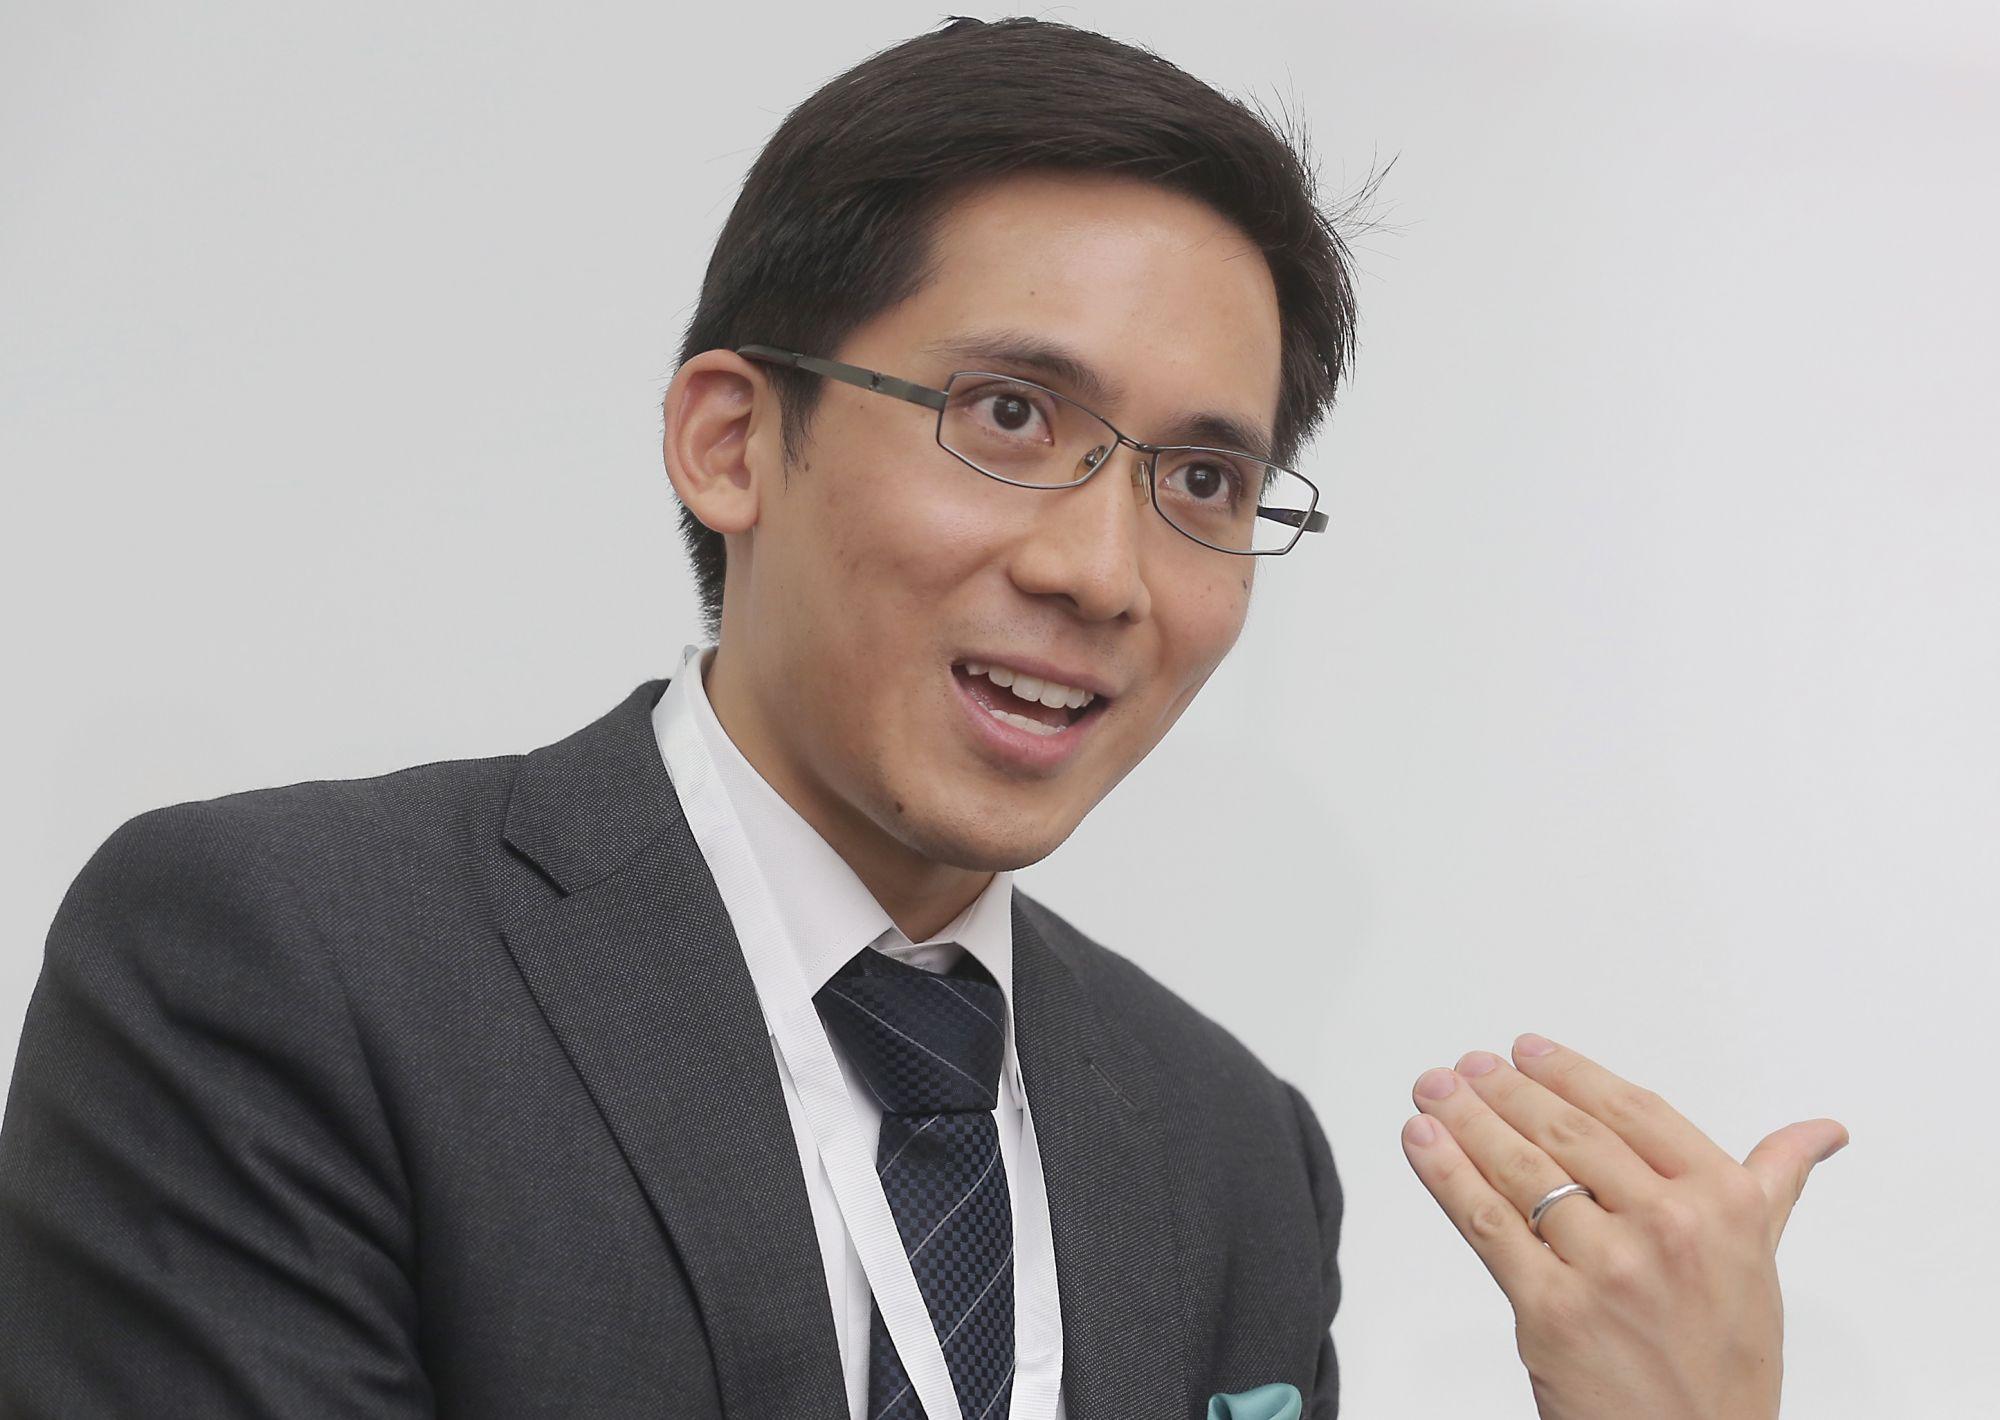 Wang Zelong